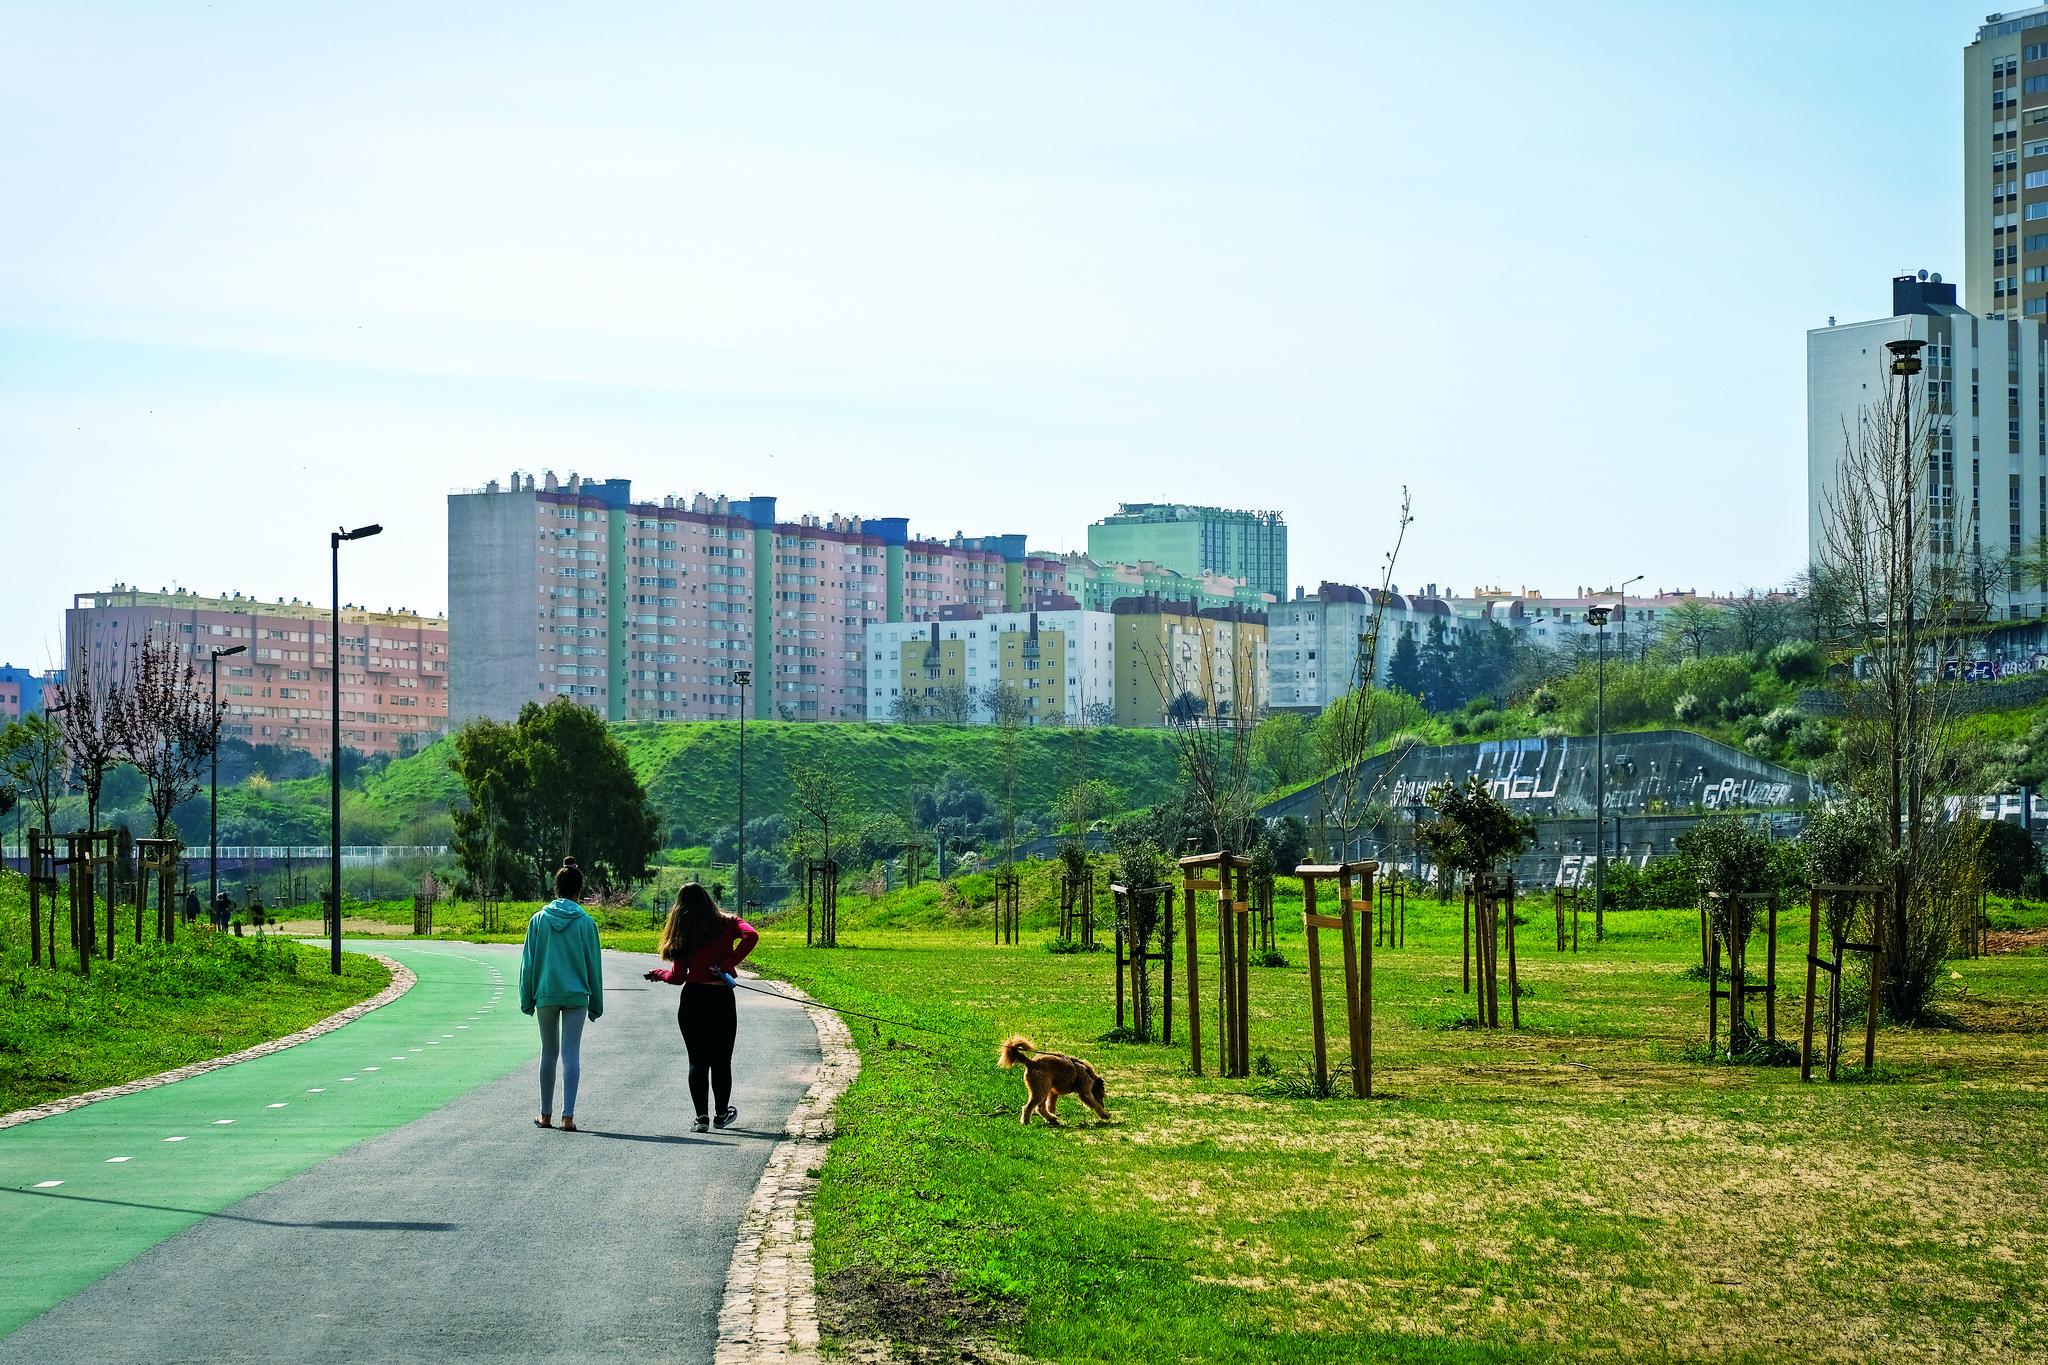 DT-Parque-Urbano-Vale-Montanha-6.jpg